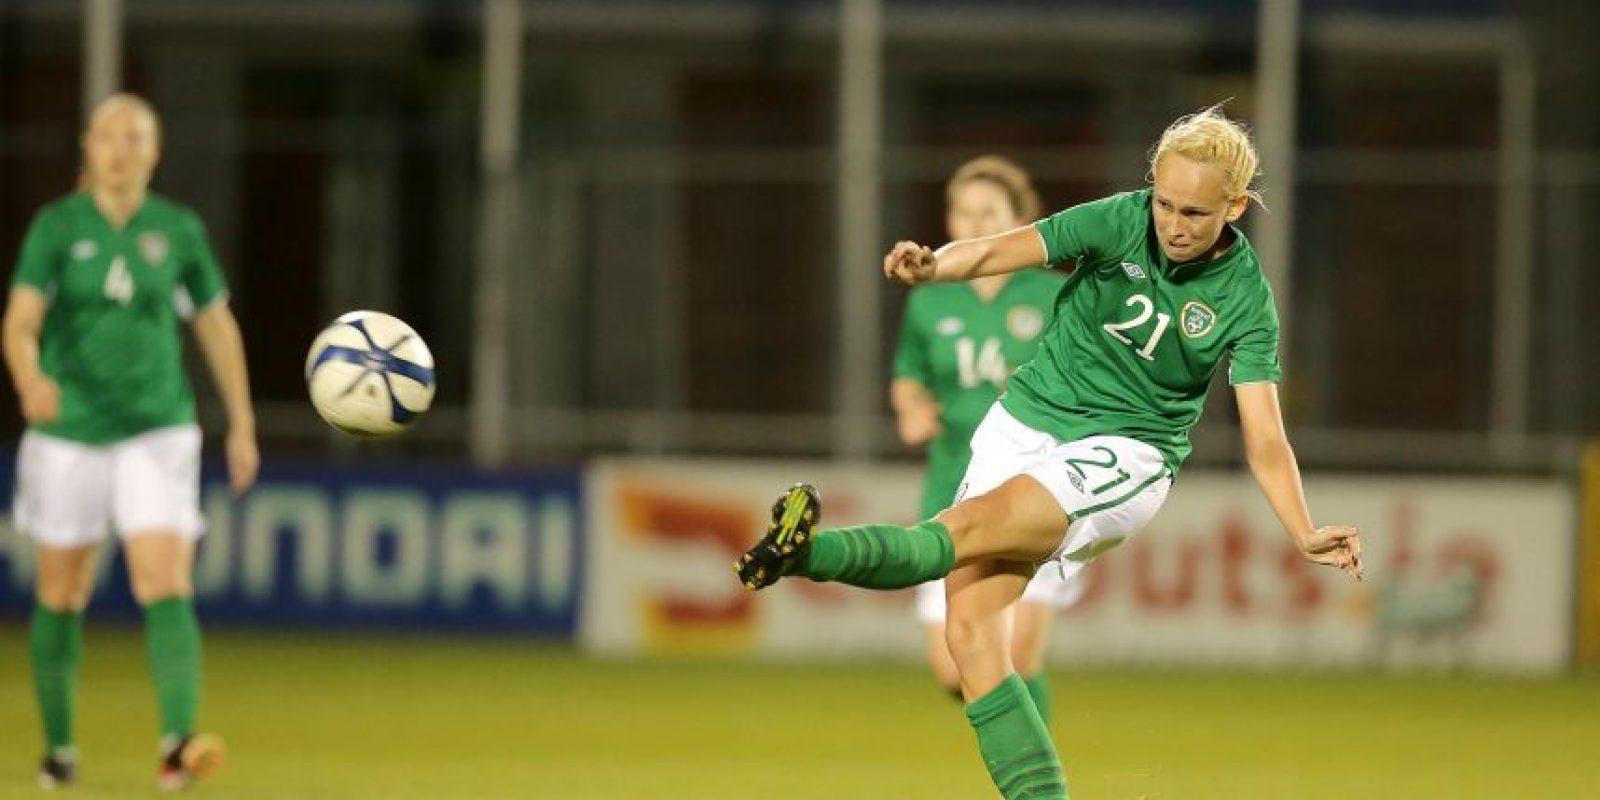 La irlandesa Stephanie Roche se apuntó un golazo en su liga local Foto:irixhpost.co.uk